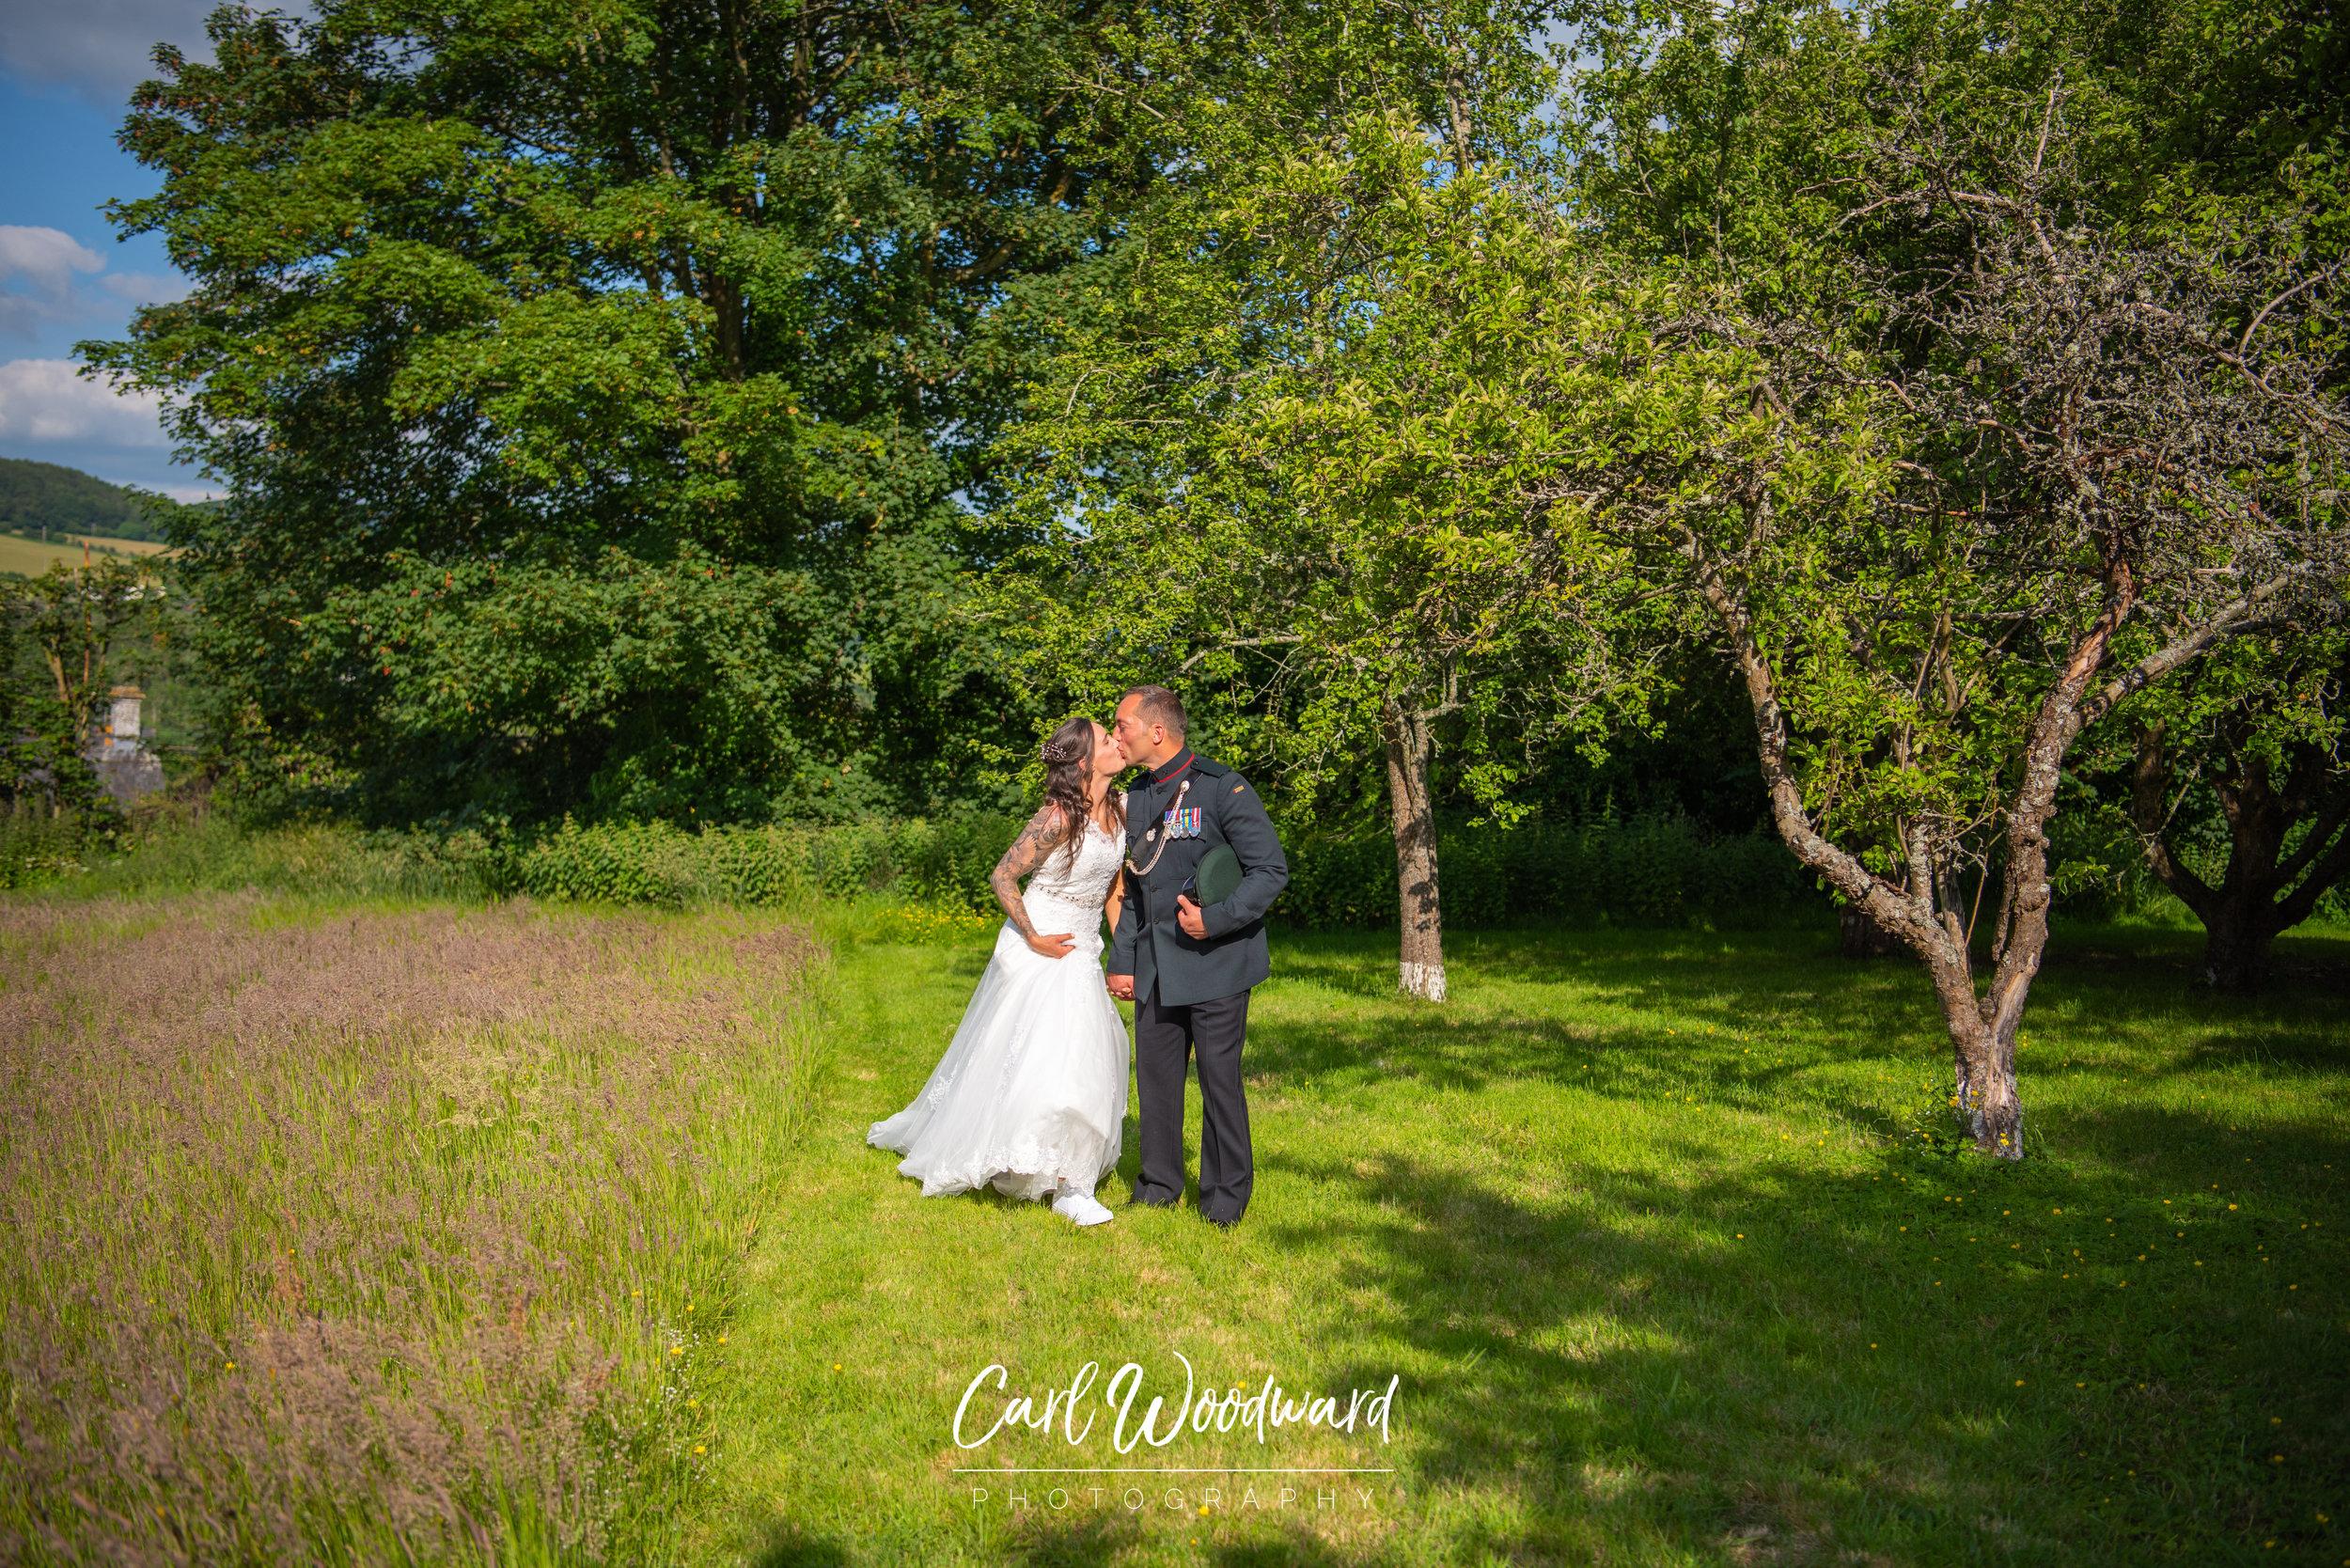 011-The-Old-Rectory-Hotel-Wedding-Photography-Cardiff-Wedding-Photography.jpg